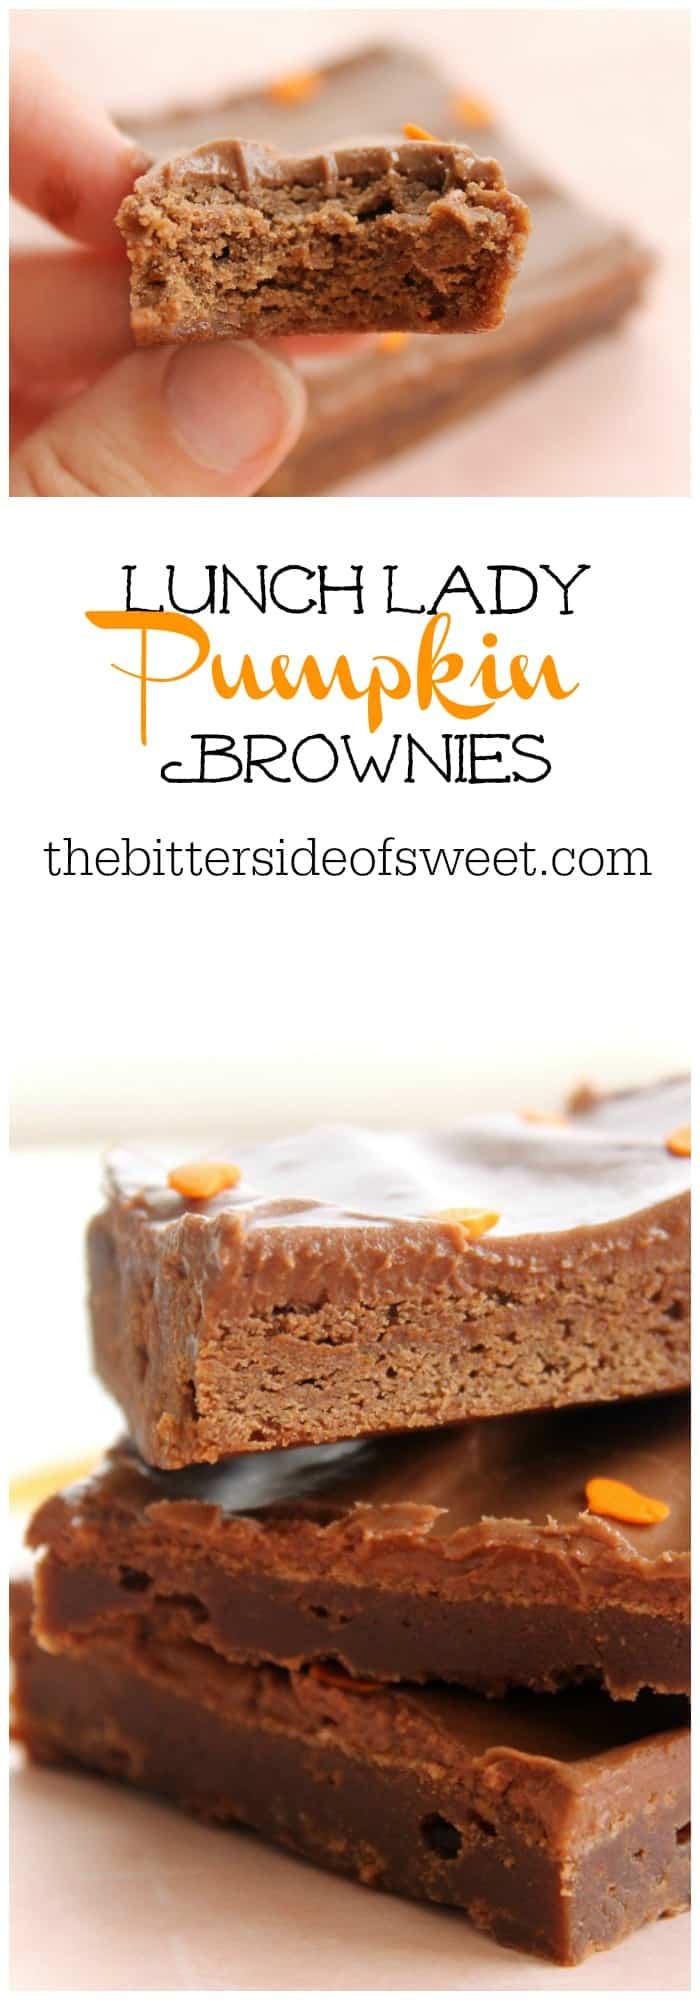 Lunch Lady Pumpkin Brownies Thebittersideofsweet